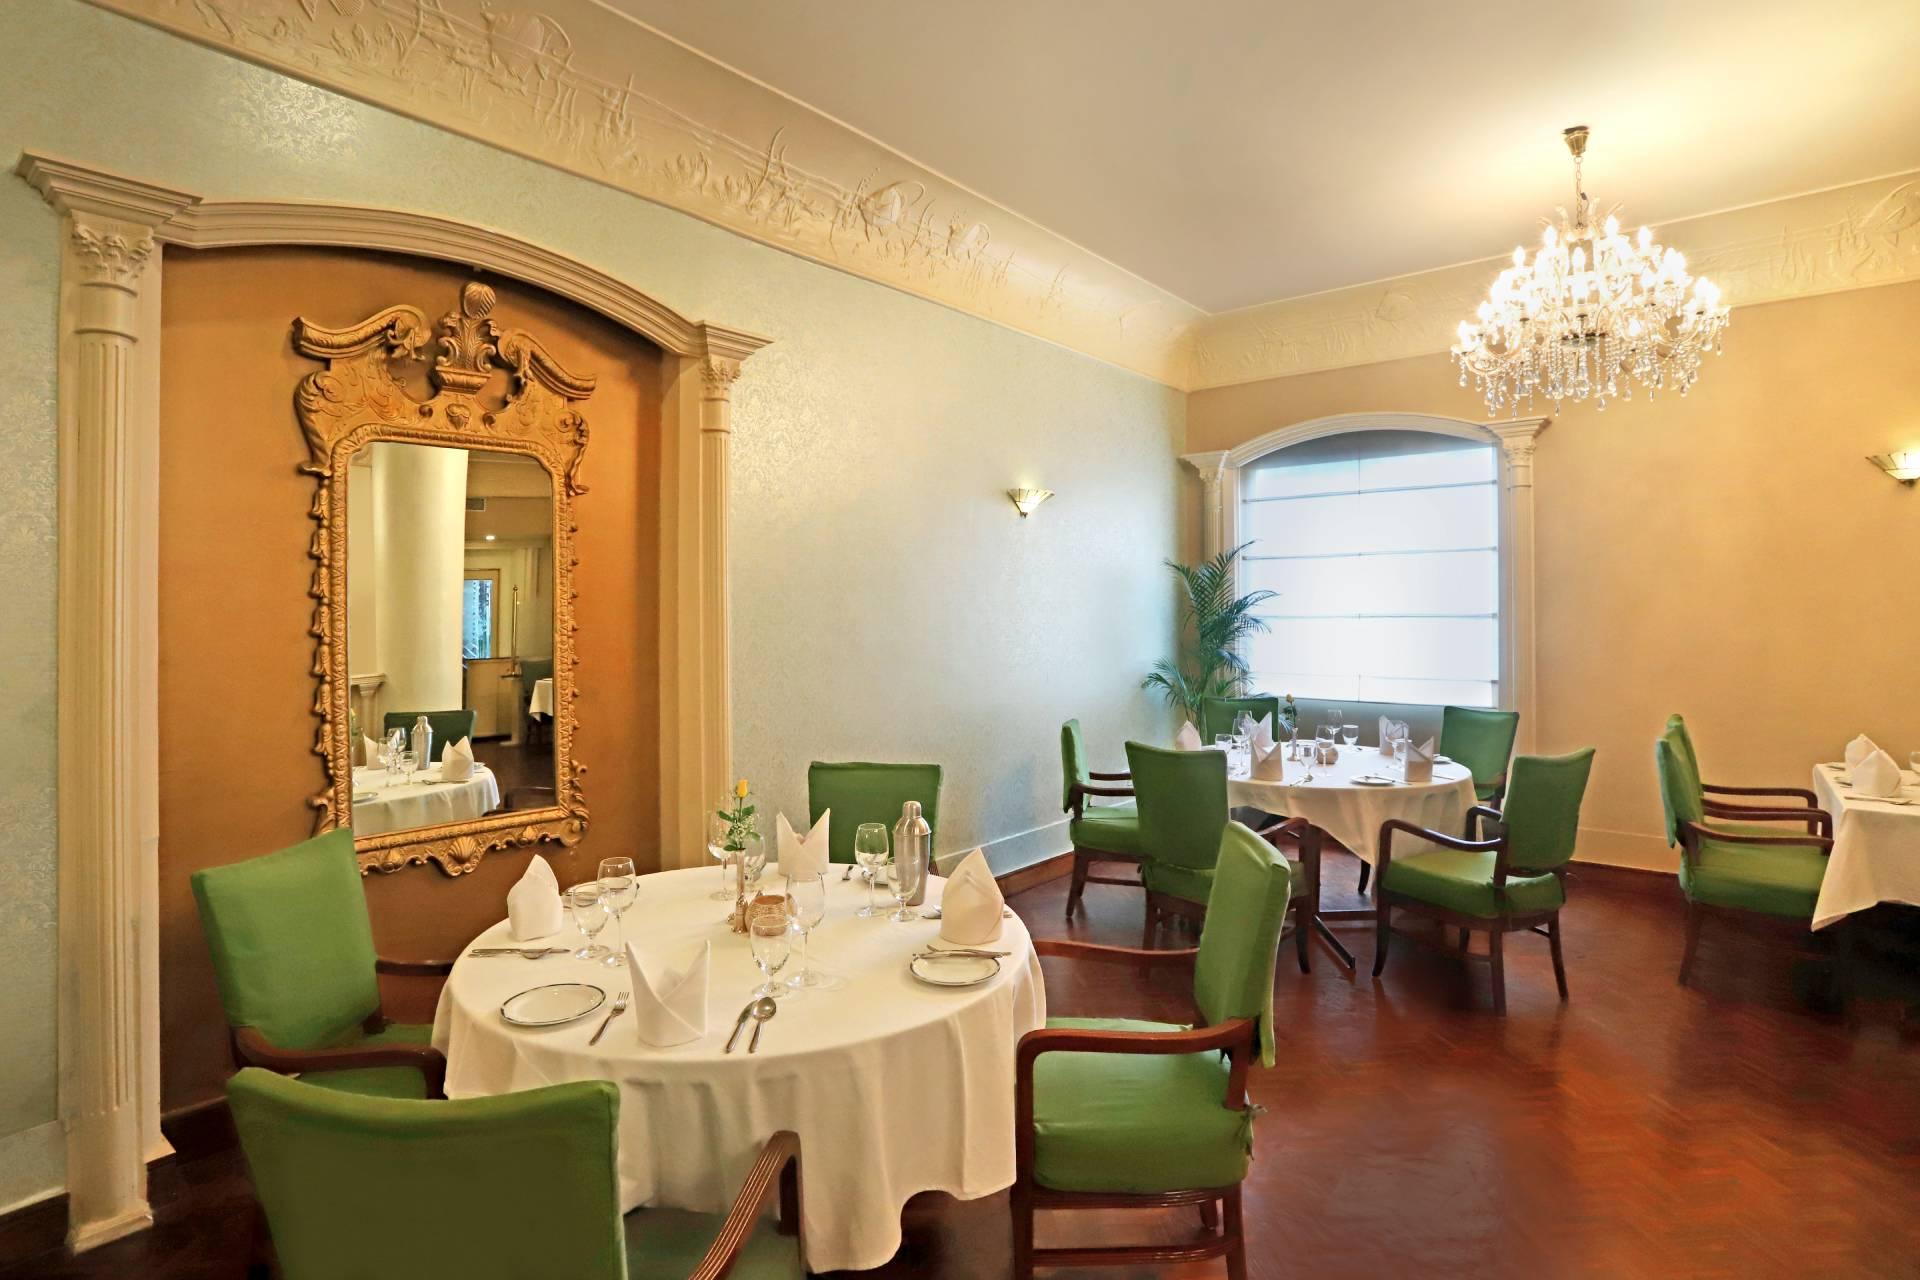 16 Society Restaurant - The Ambassador | Heritage Hotels in Mumbai, Aurangabad, Chennai - The Society